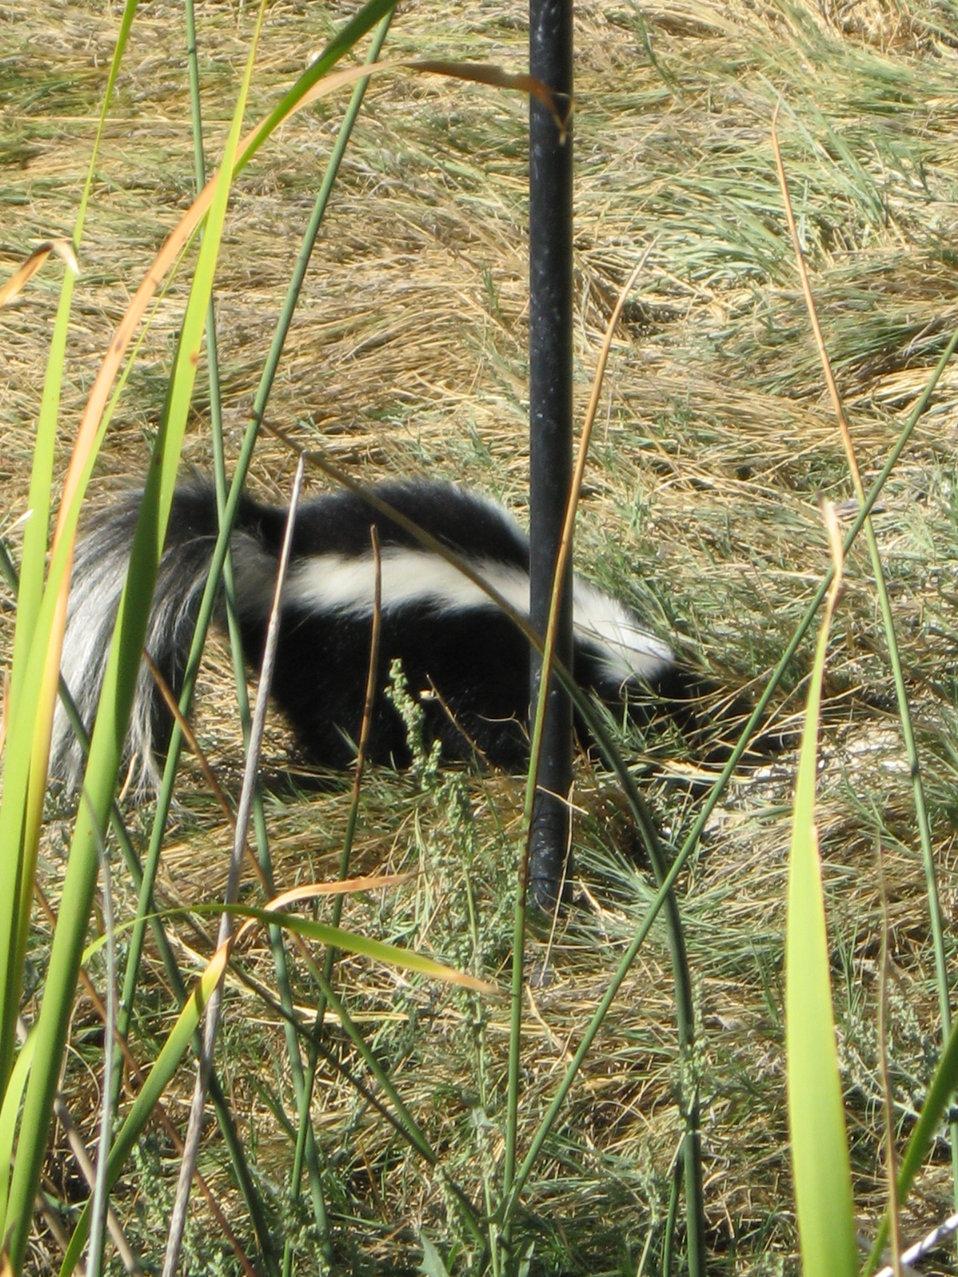 Skunk at the Bird Feeder